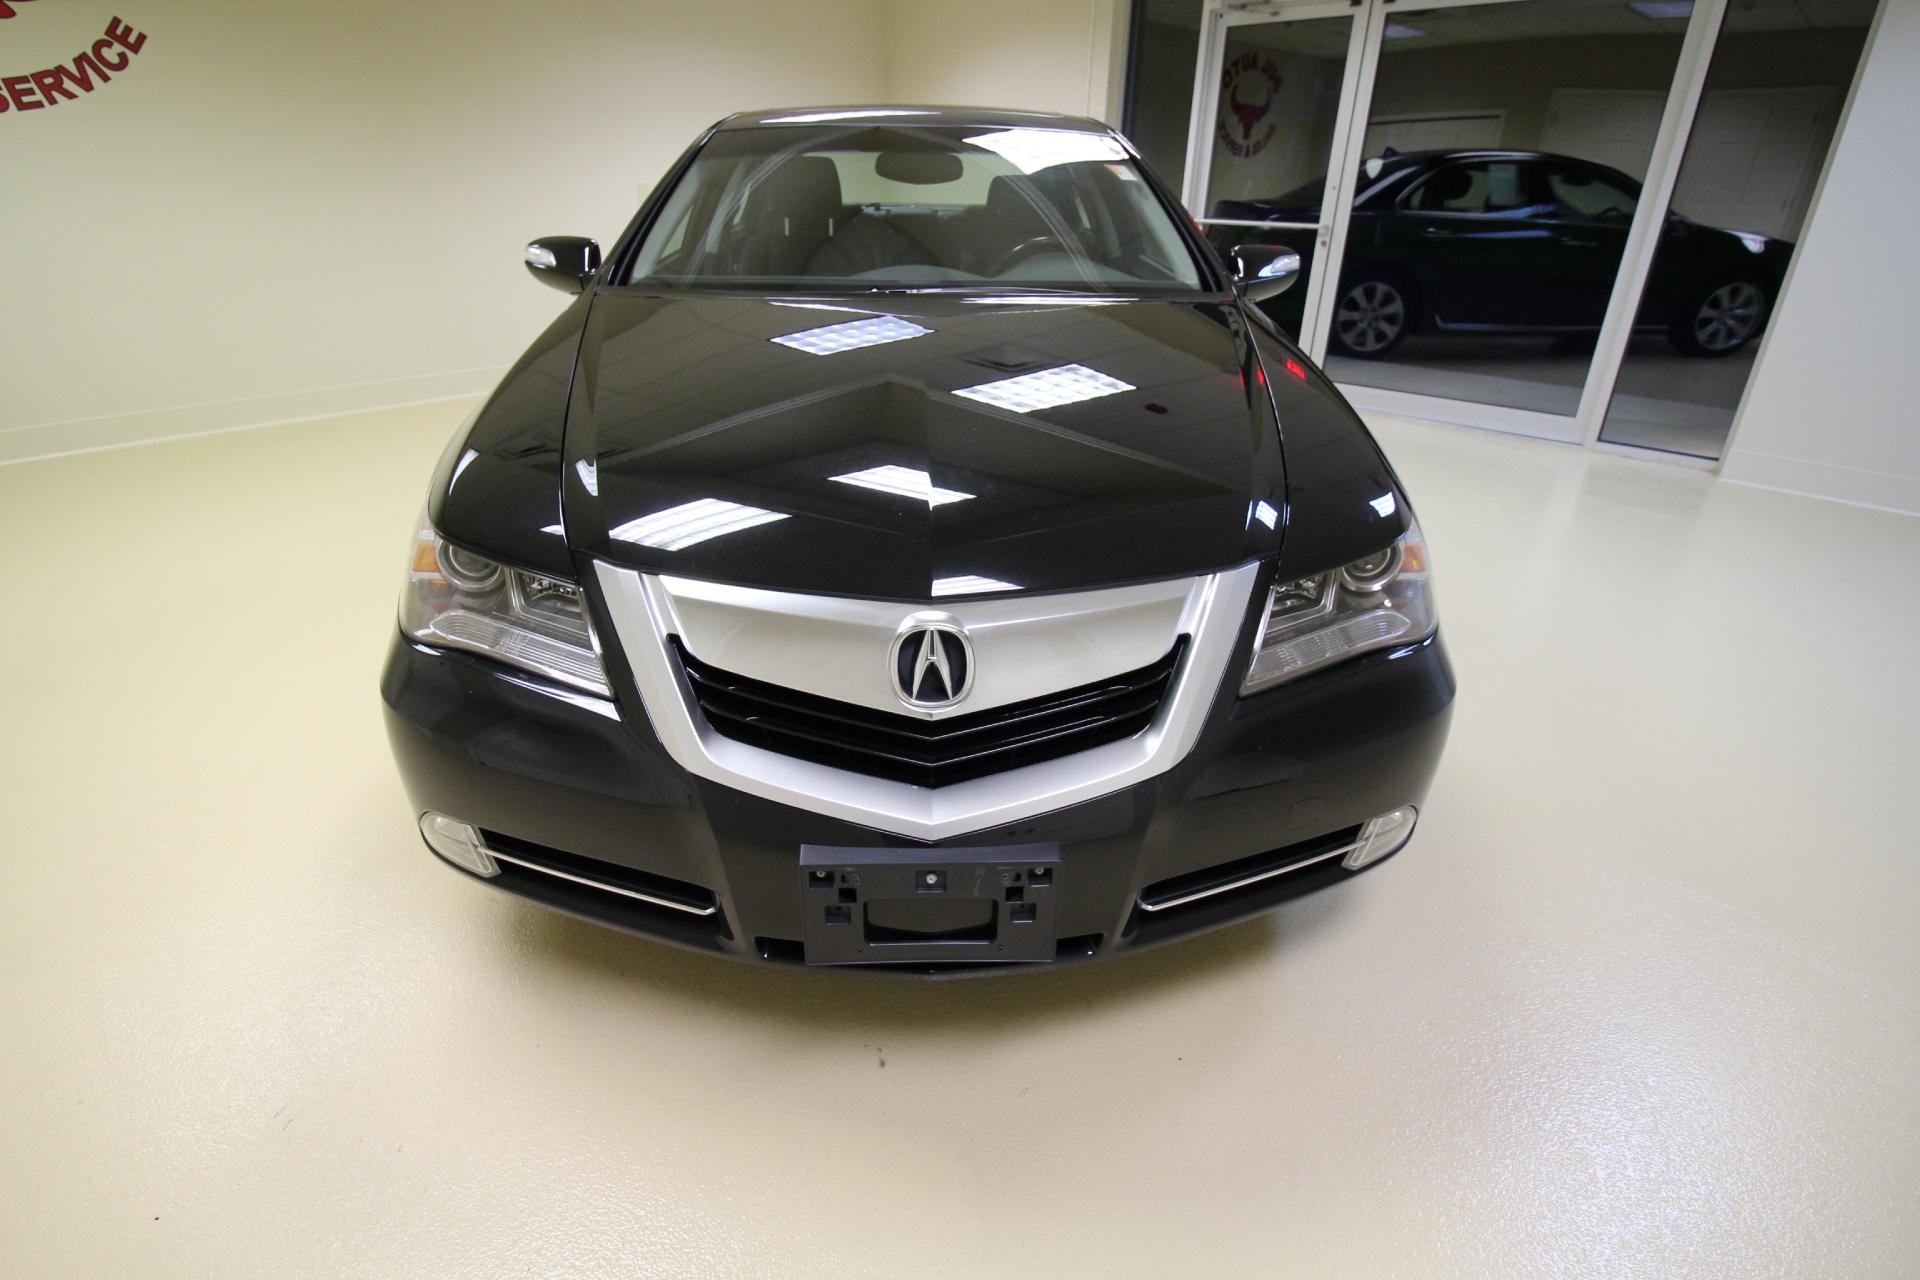 acura en view metallic asphalt rl wallpaper top silver grass cars style